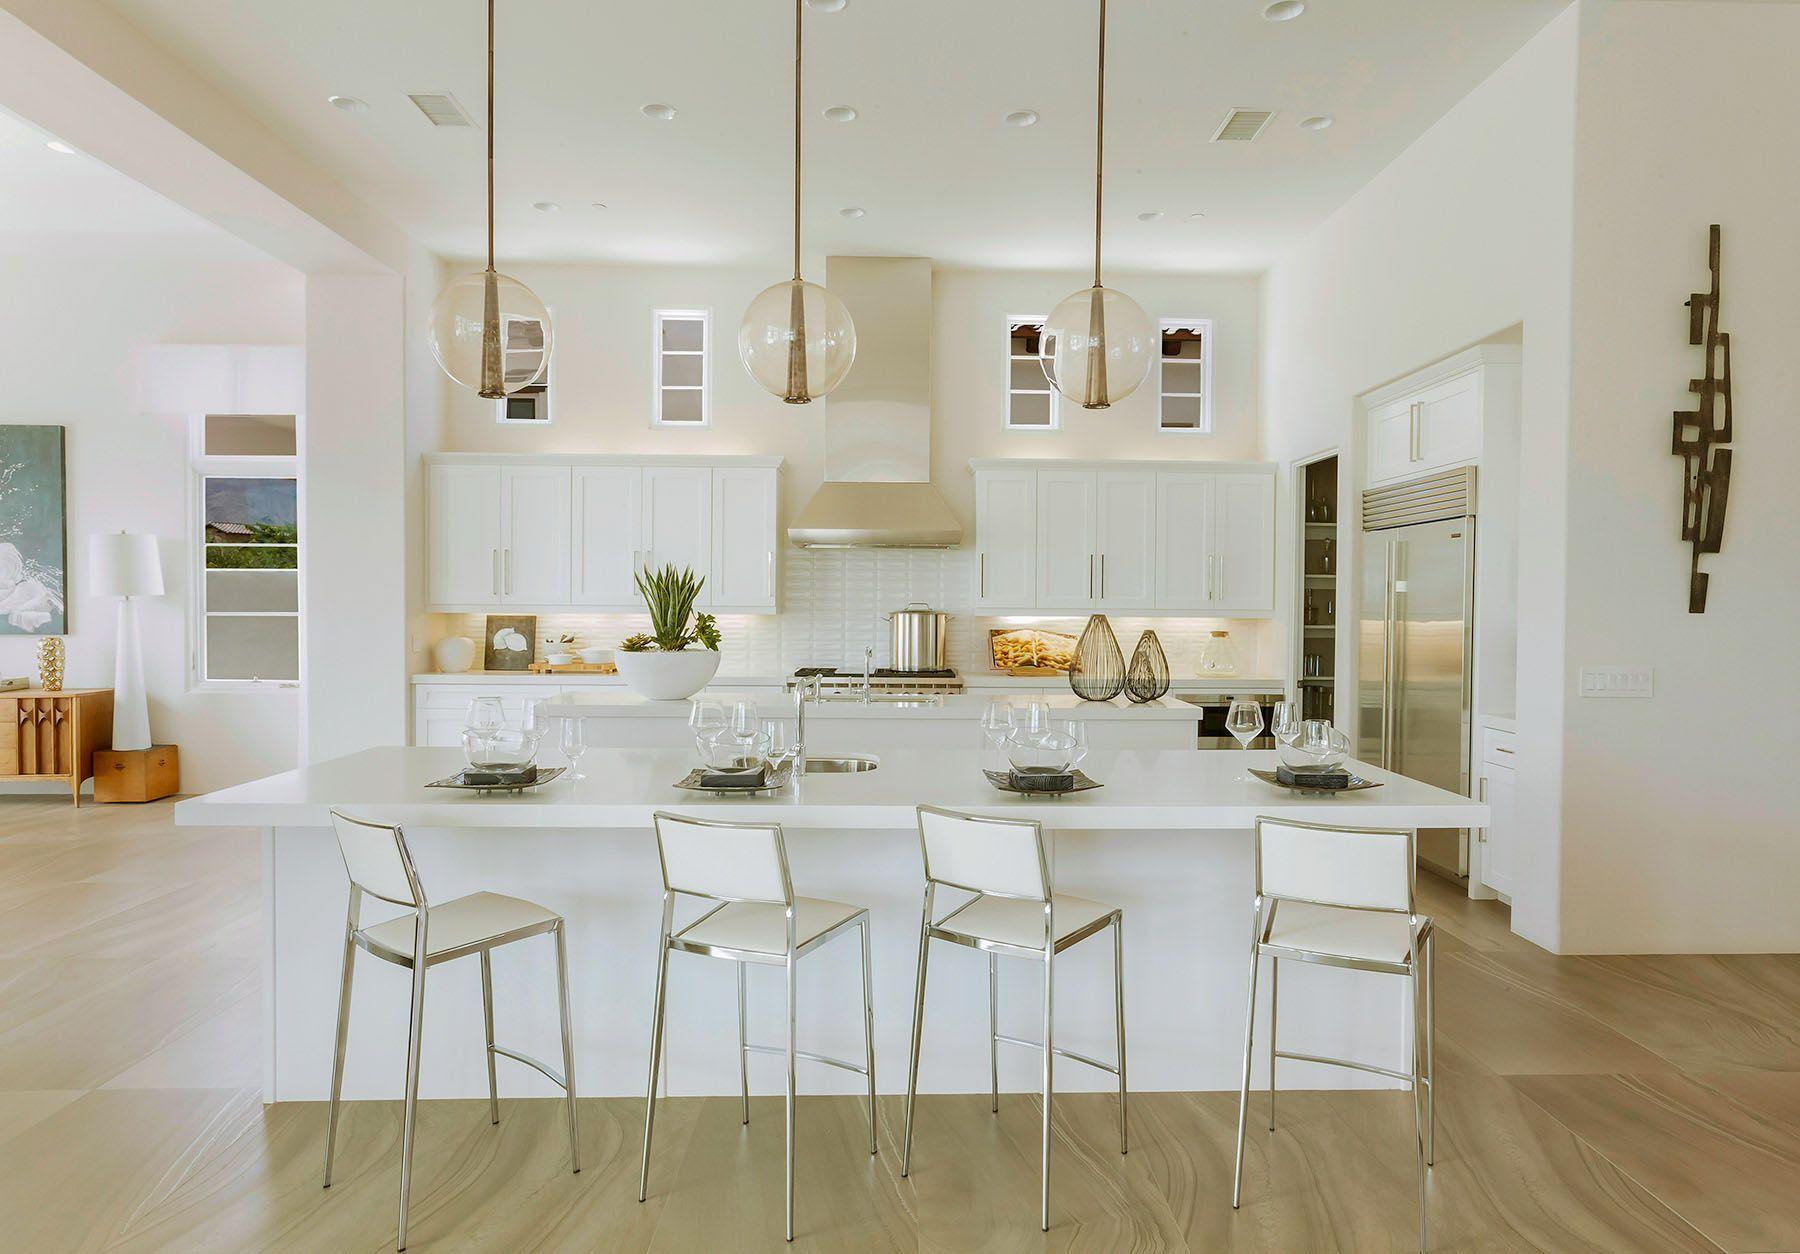 Kitchens & Dining 1.jpg